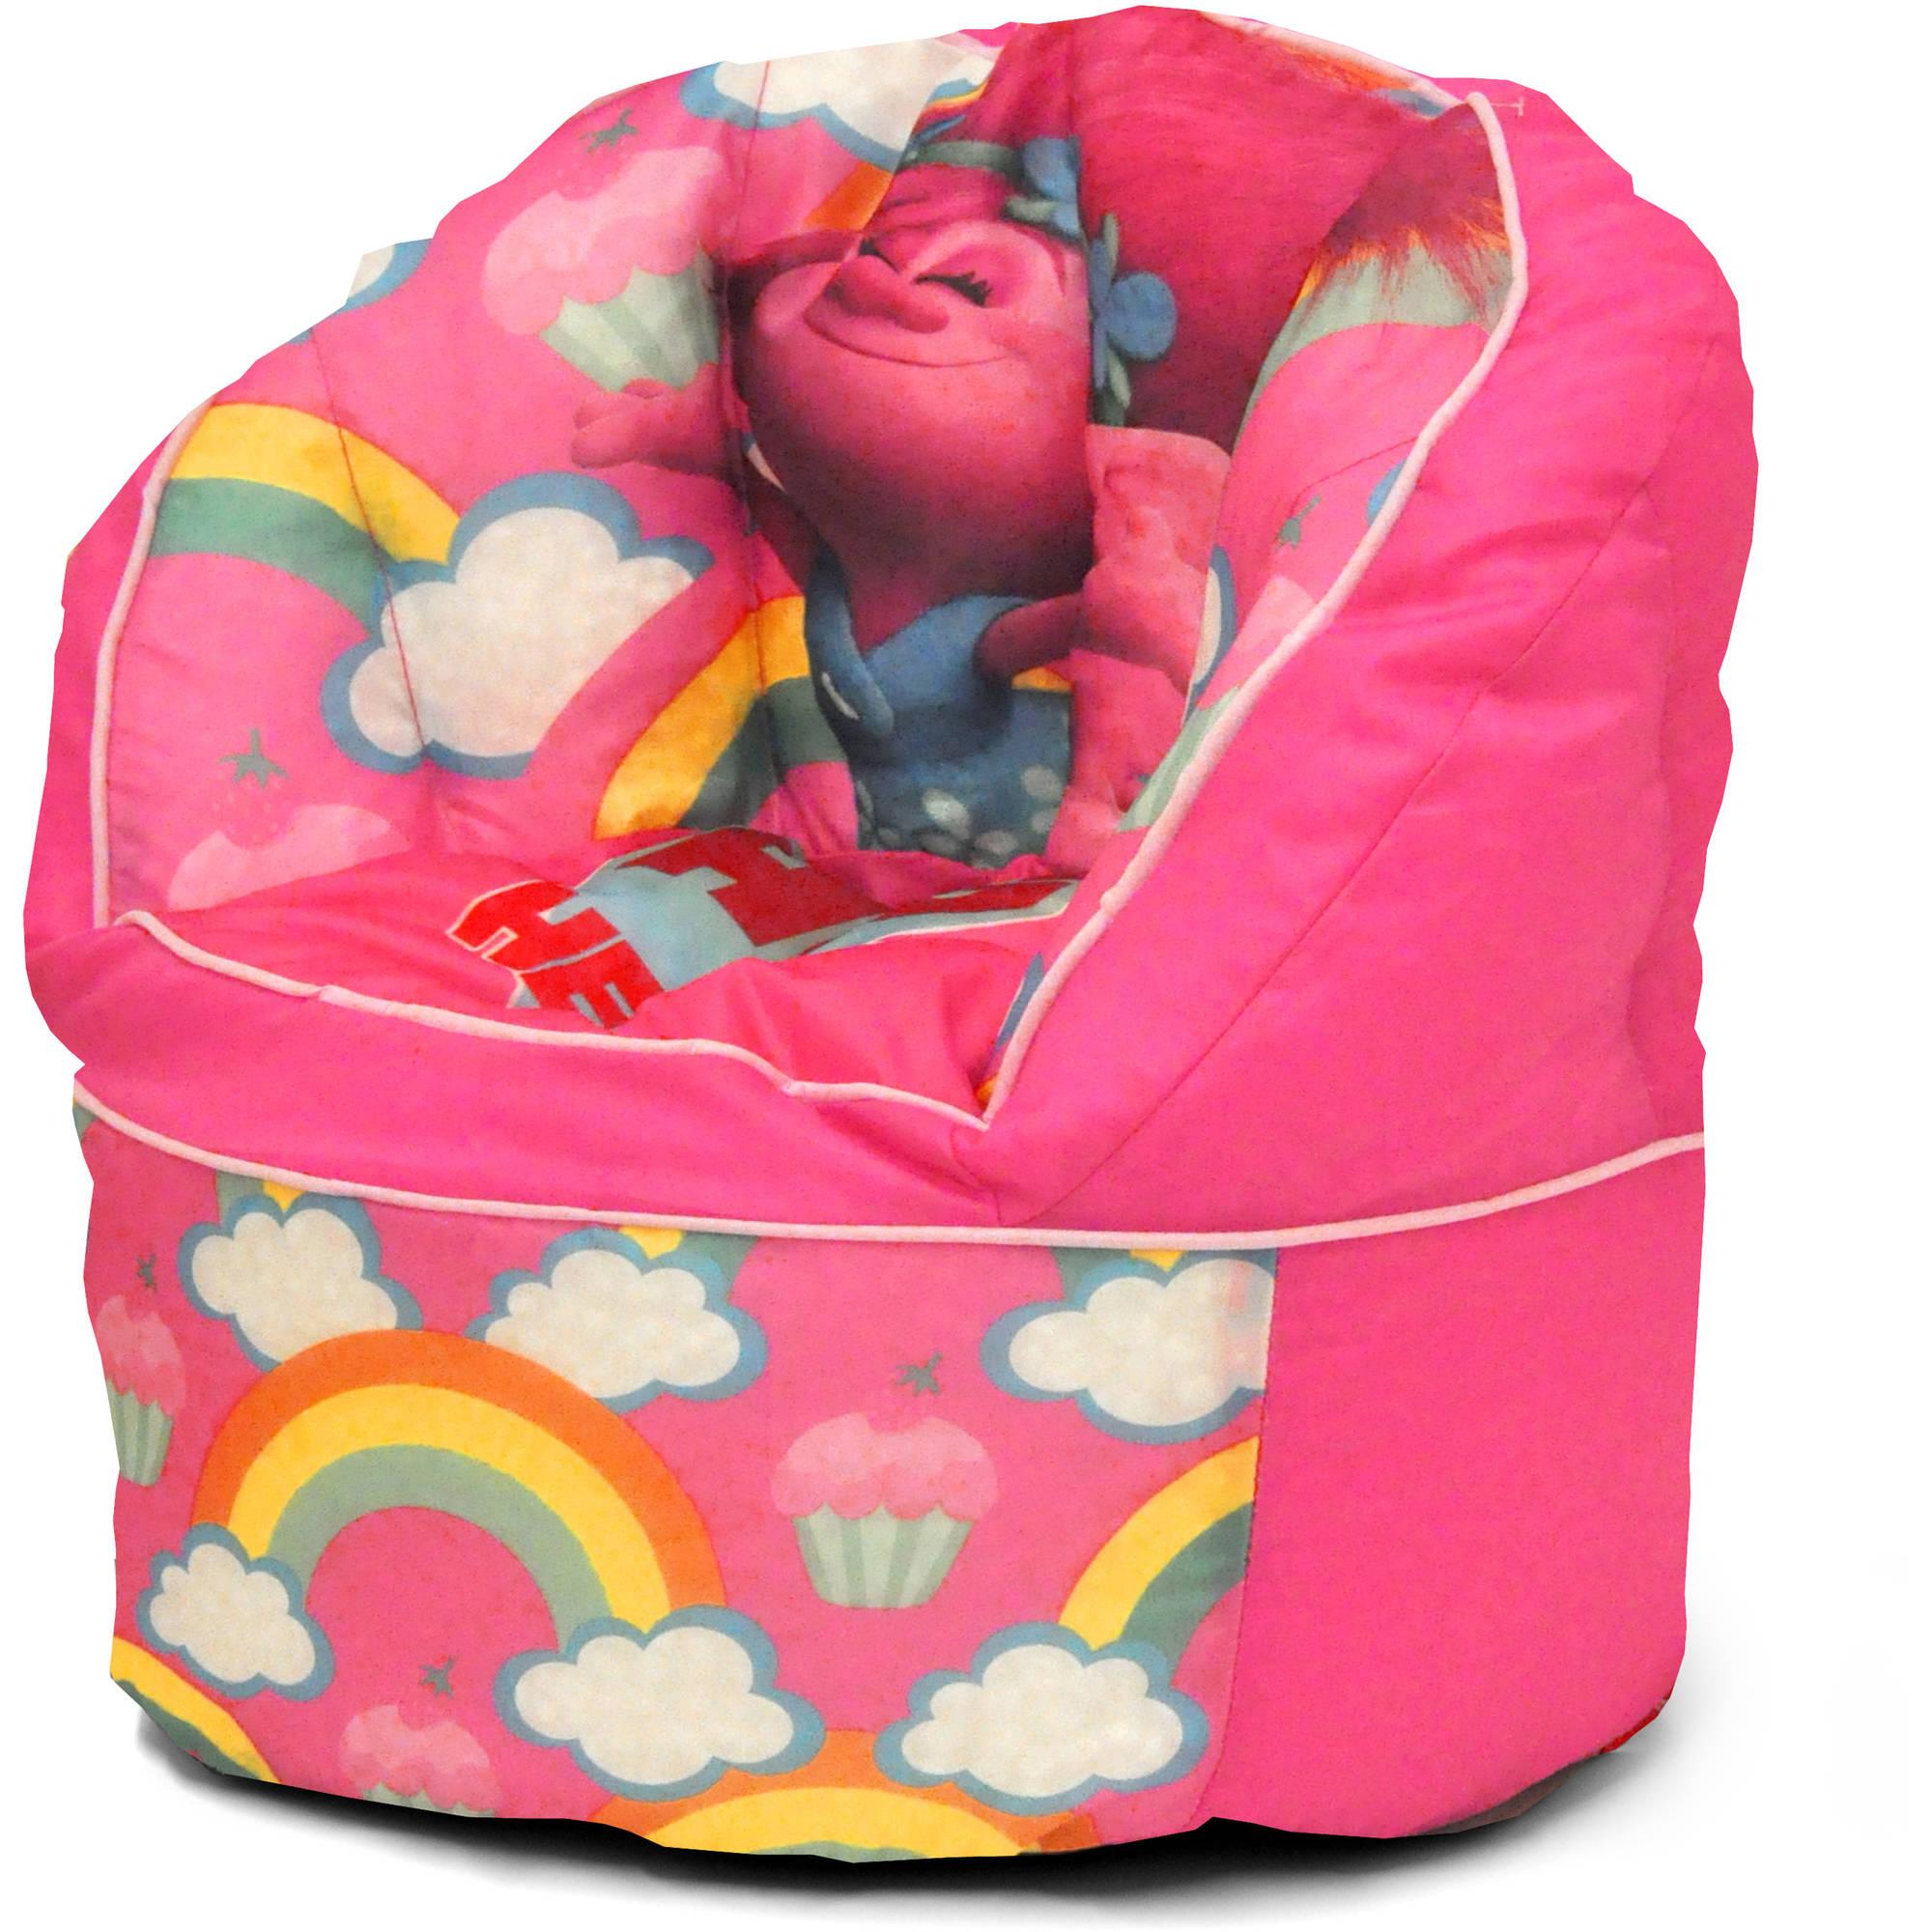 disney dream sofa bed best toddler trolls bean bag chair